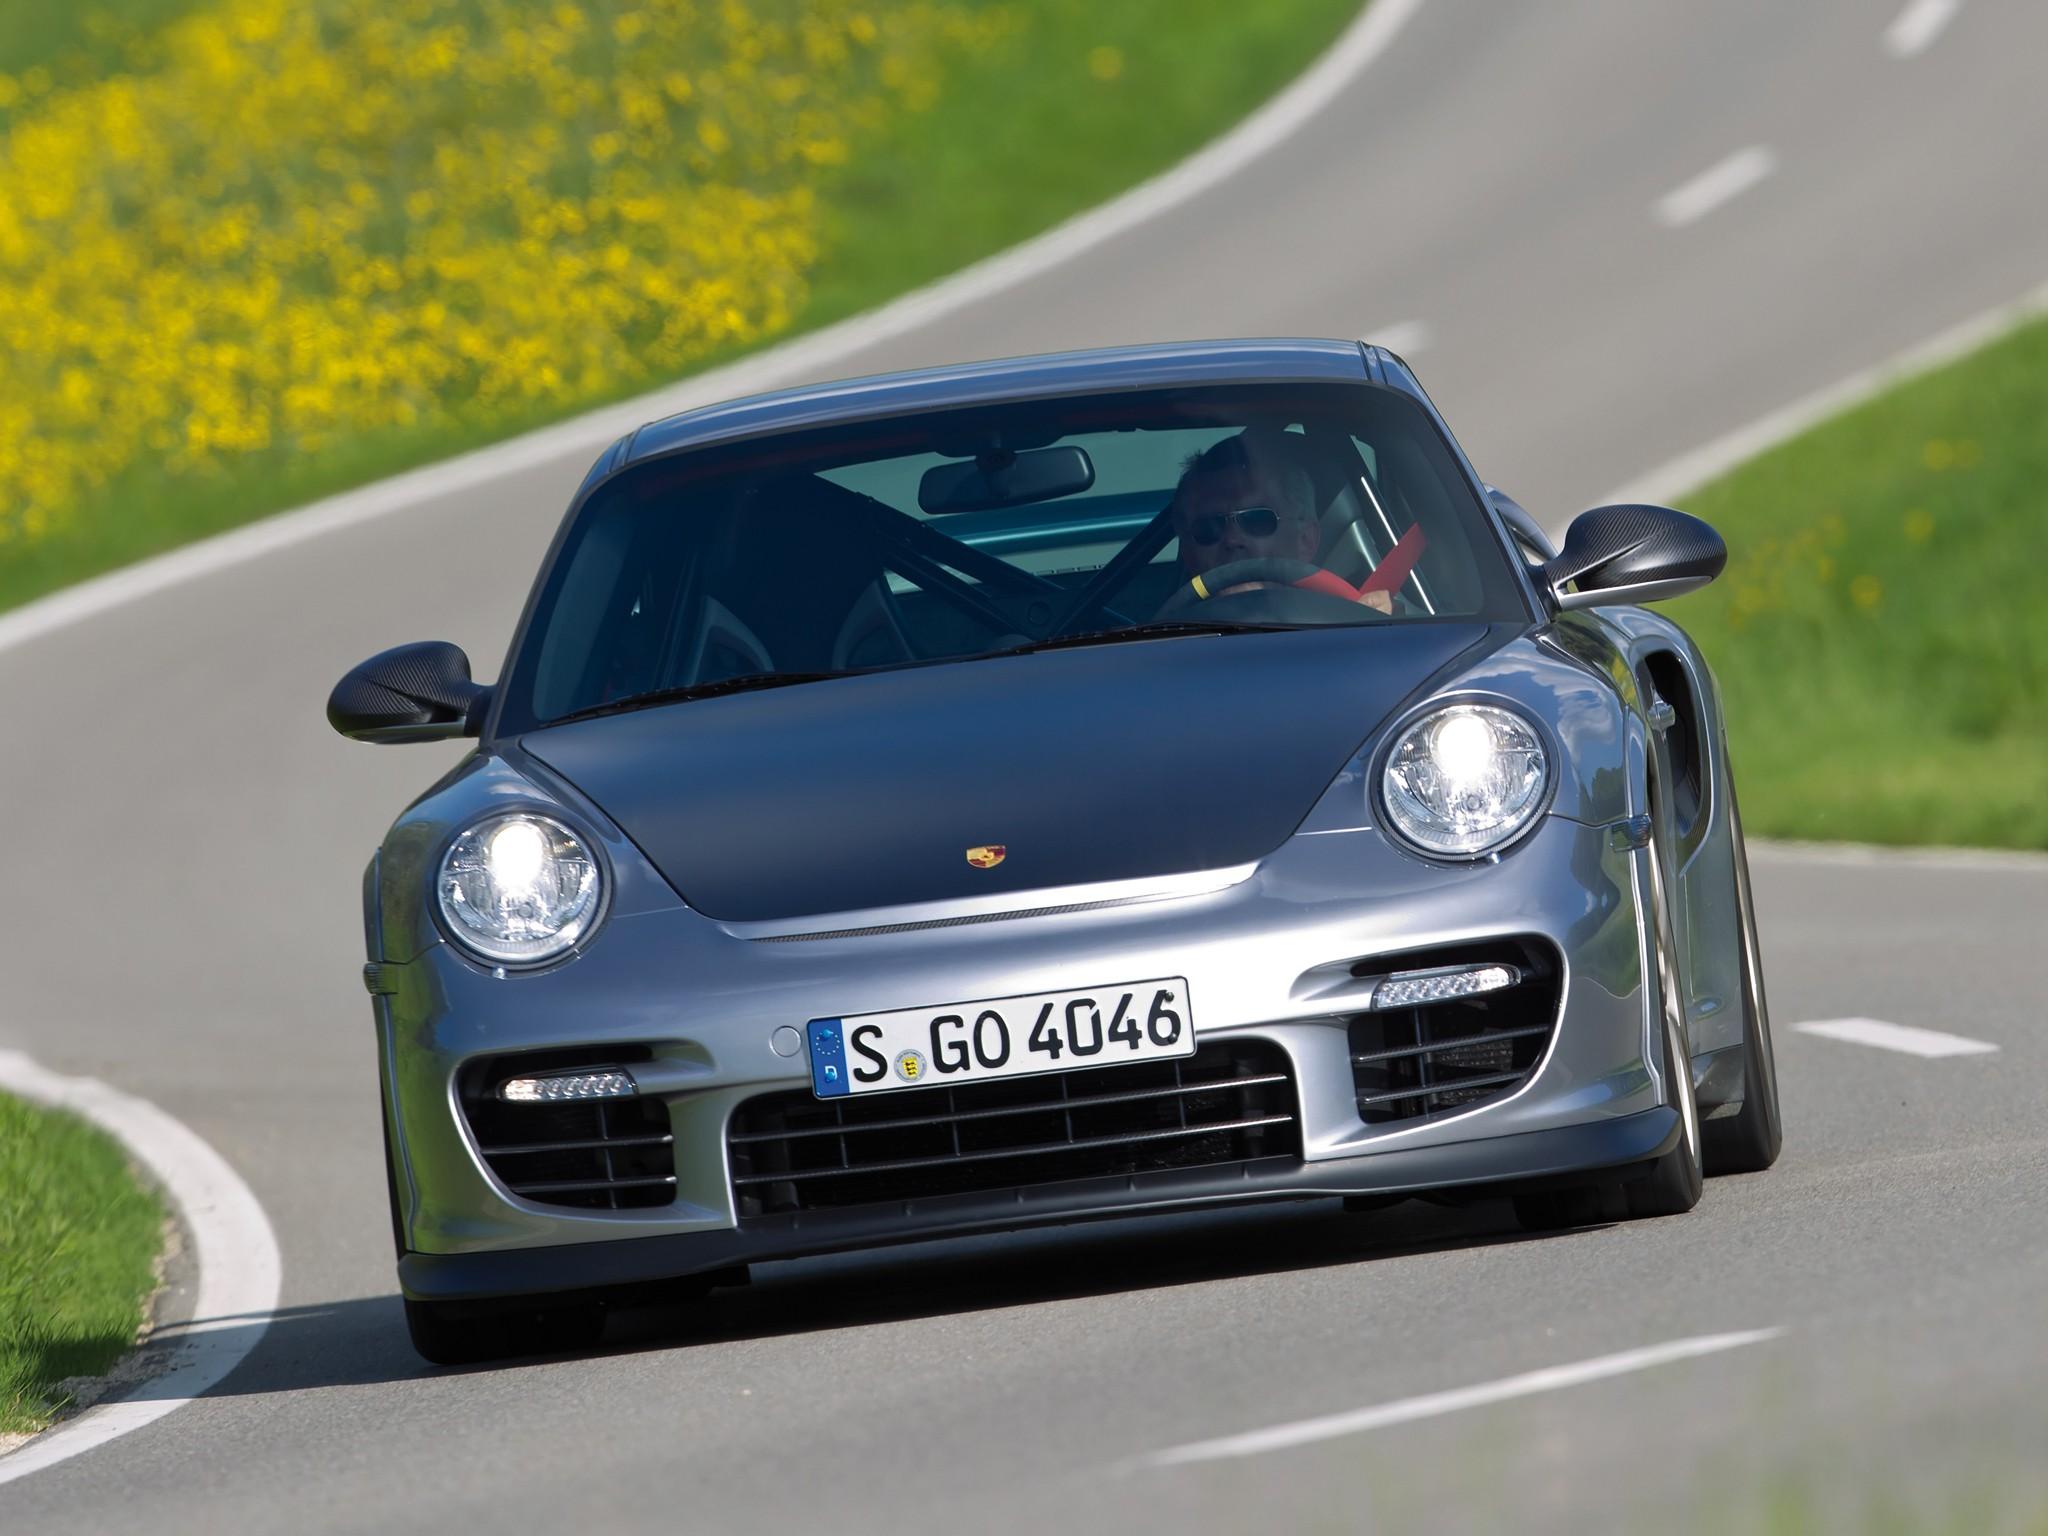 porsche 911 gt2 rs specs 2010 2011 2012 autoevolution. Black Bedroom Furniture Sets. Home Design Ideas